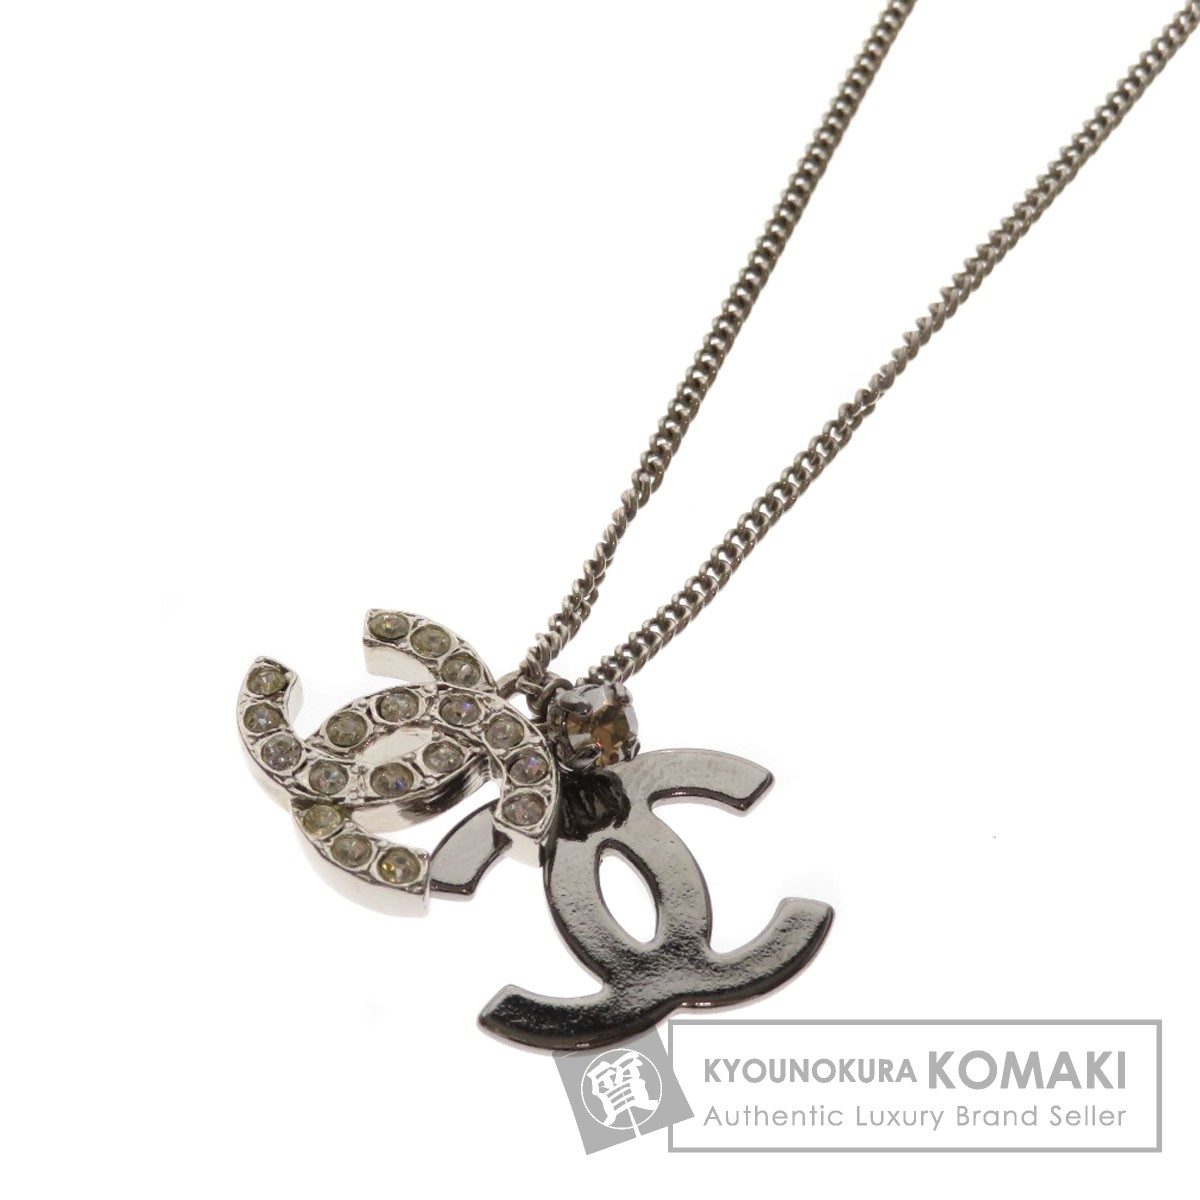 CHANEL ココマーク ラインストーン ネックレス 金属製 レディース 【中古】【シャネル】